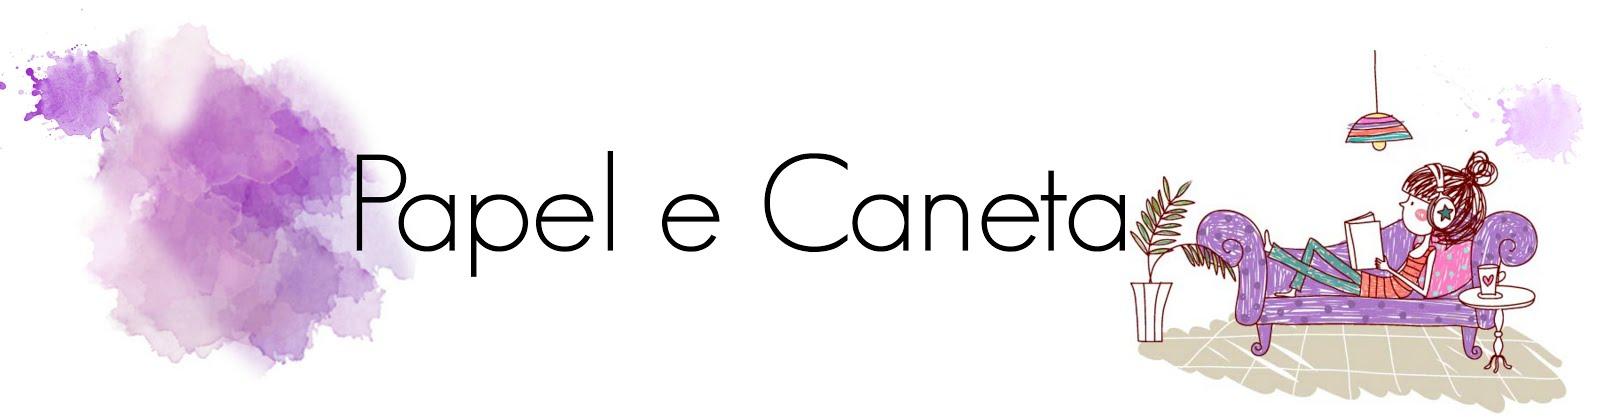 Papel & Caneta